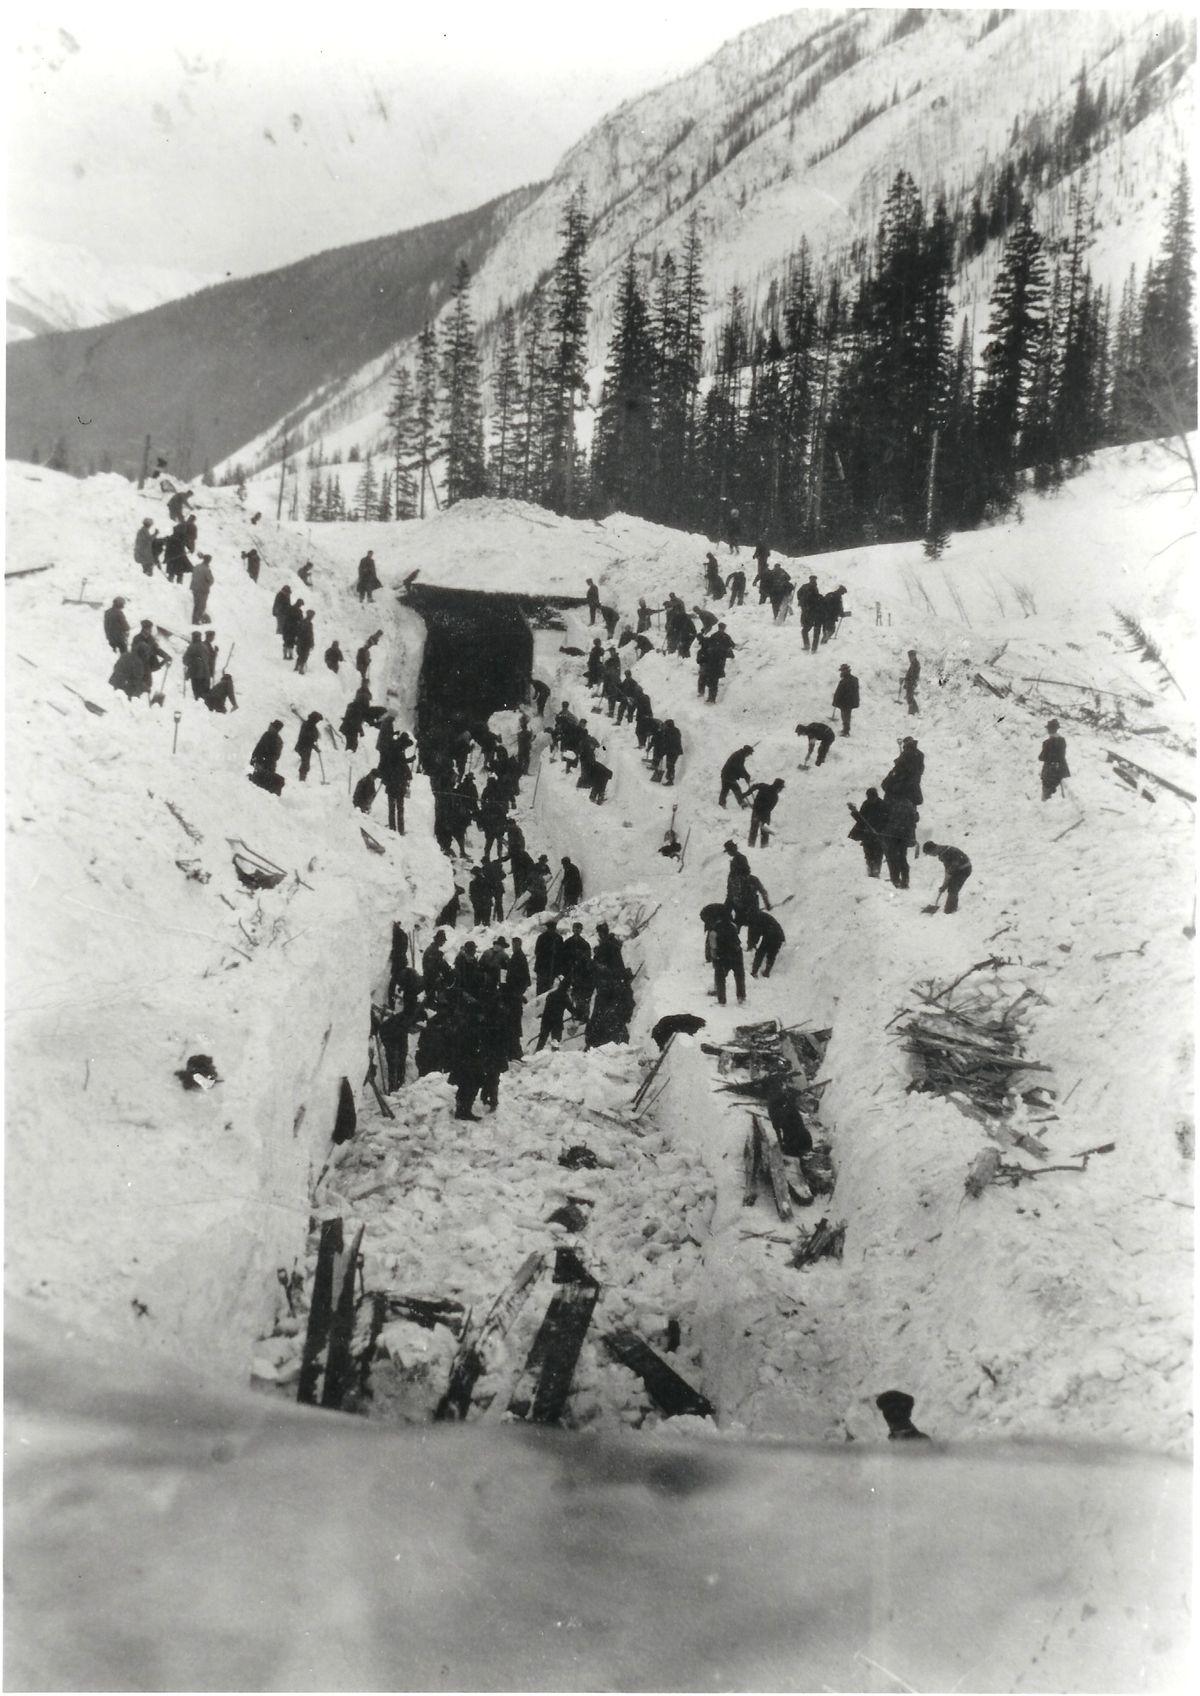 1910 rogers pass avalanche wikipedia